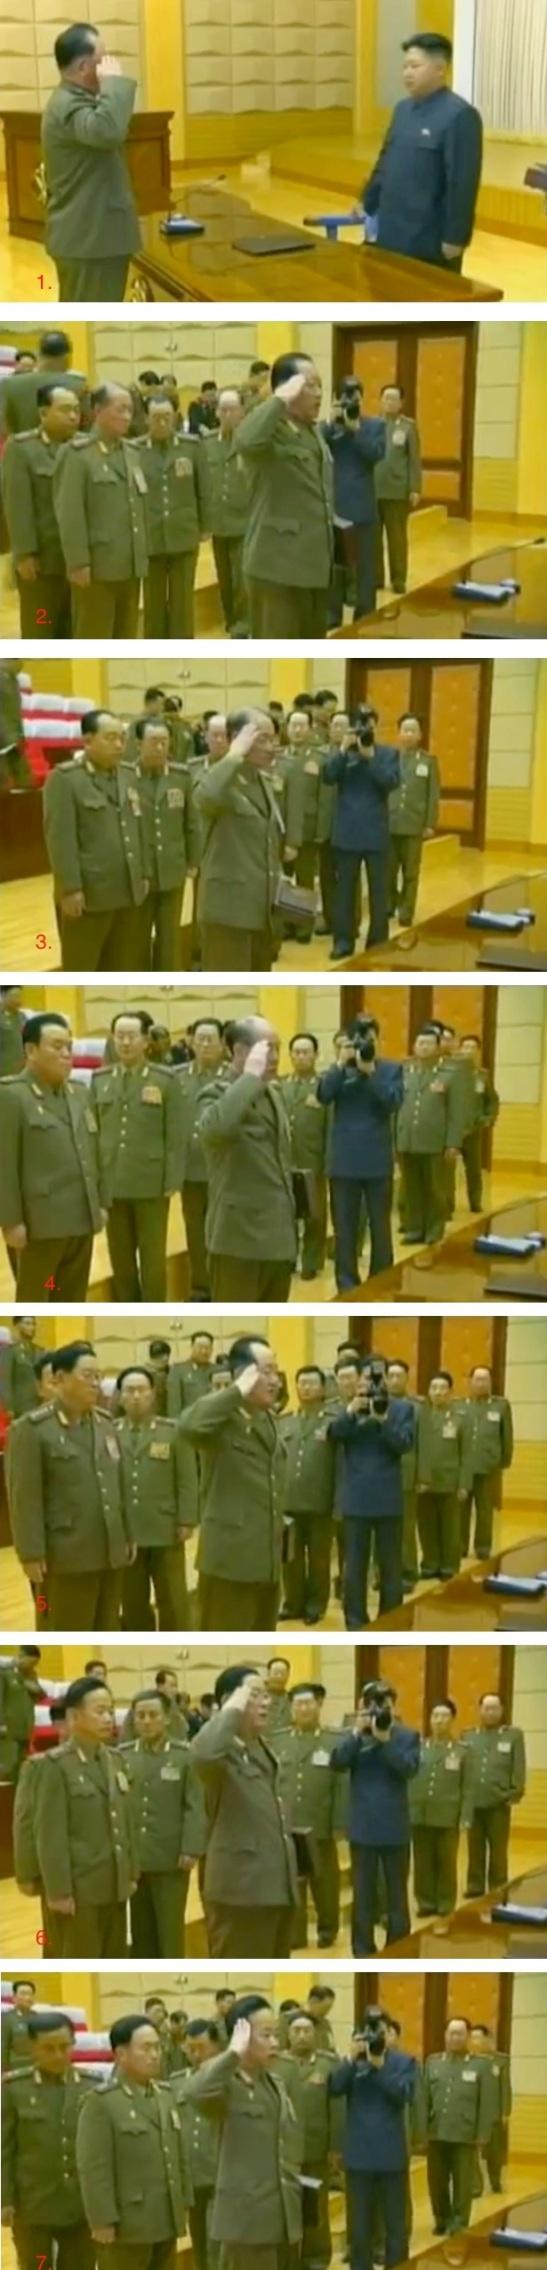 Presented with handguns at the conclusion of the expanded CMC meeting in early 2012 were: Gen. Ri Pyong Chol (1.), Gen. Choe Pu Il (2.), Gen. Yun Jong Rin (3.), Gen. Ri Myong Su (4.), Col. Gen. Jo Kyong Chol (5.), Gen. Pak Jae Gyong (6.), Lt. Gen. Pak Jong Chon (7.) (Photos: KCTV screengrabs)